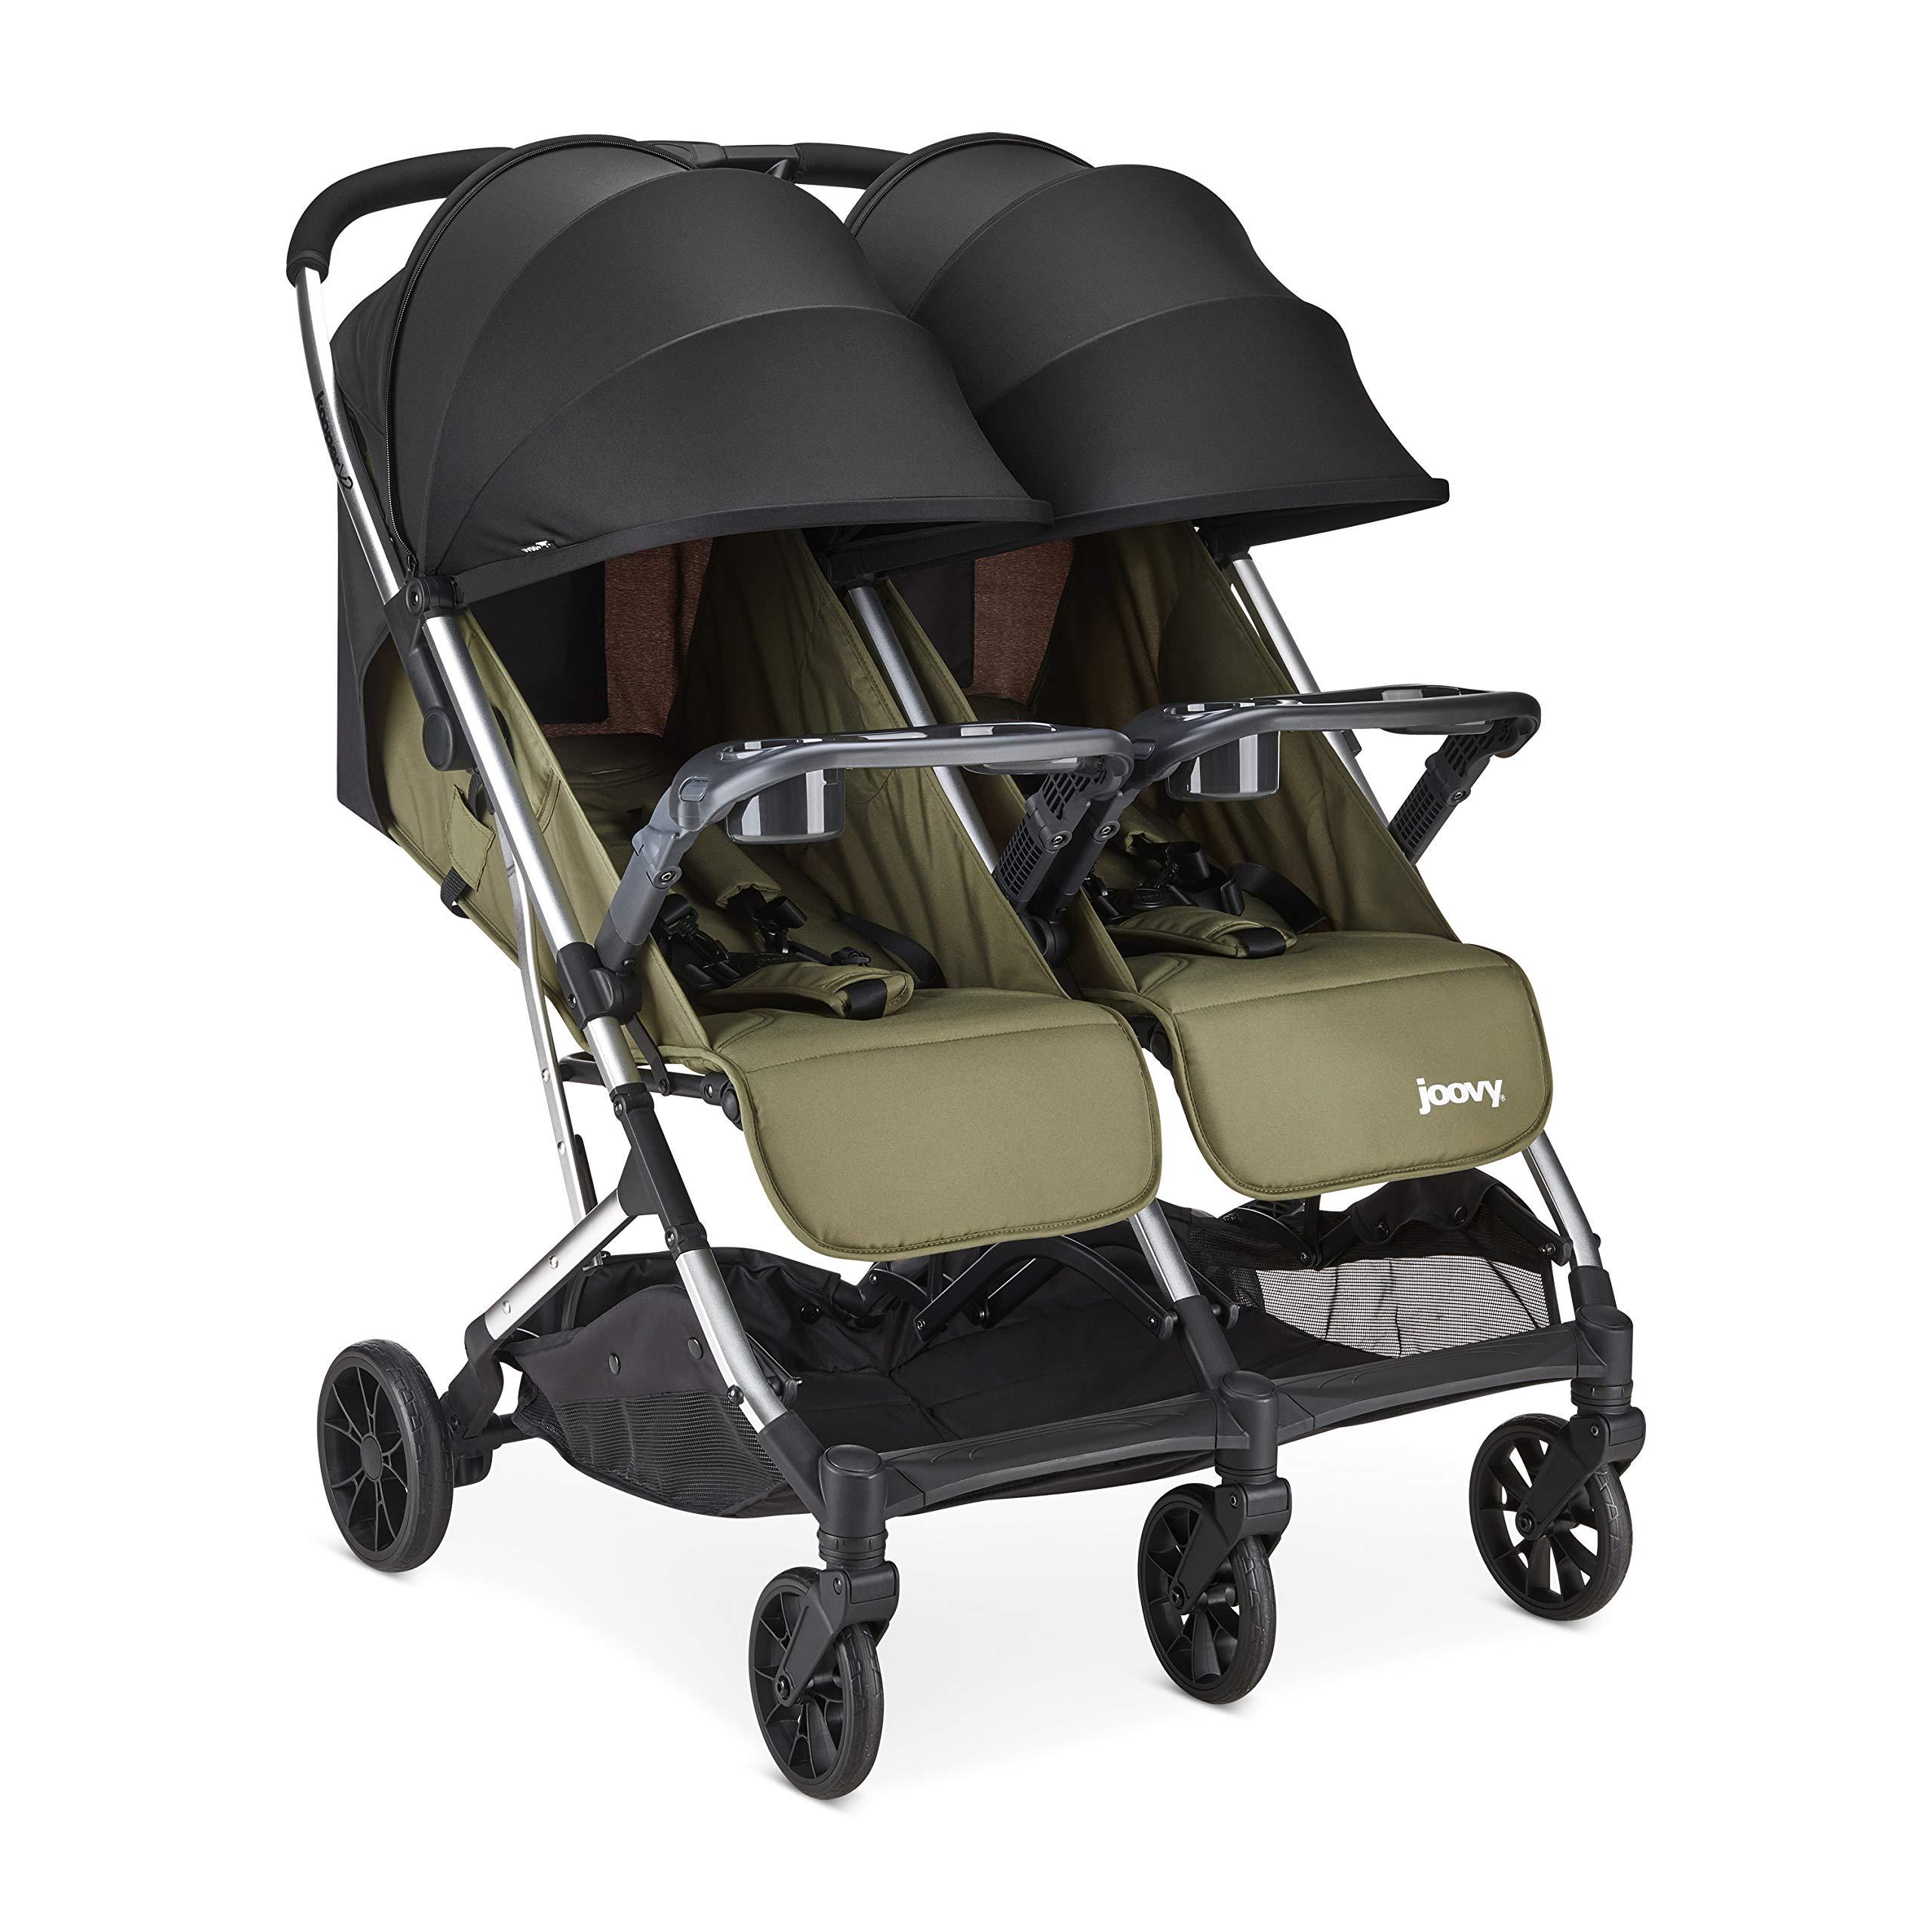 Joovy 8232 Kooper X2 Stroller, Olive